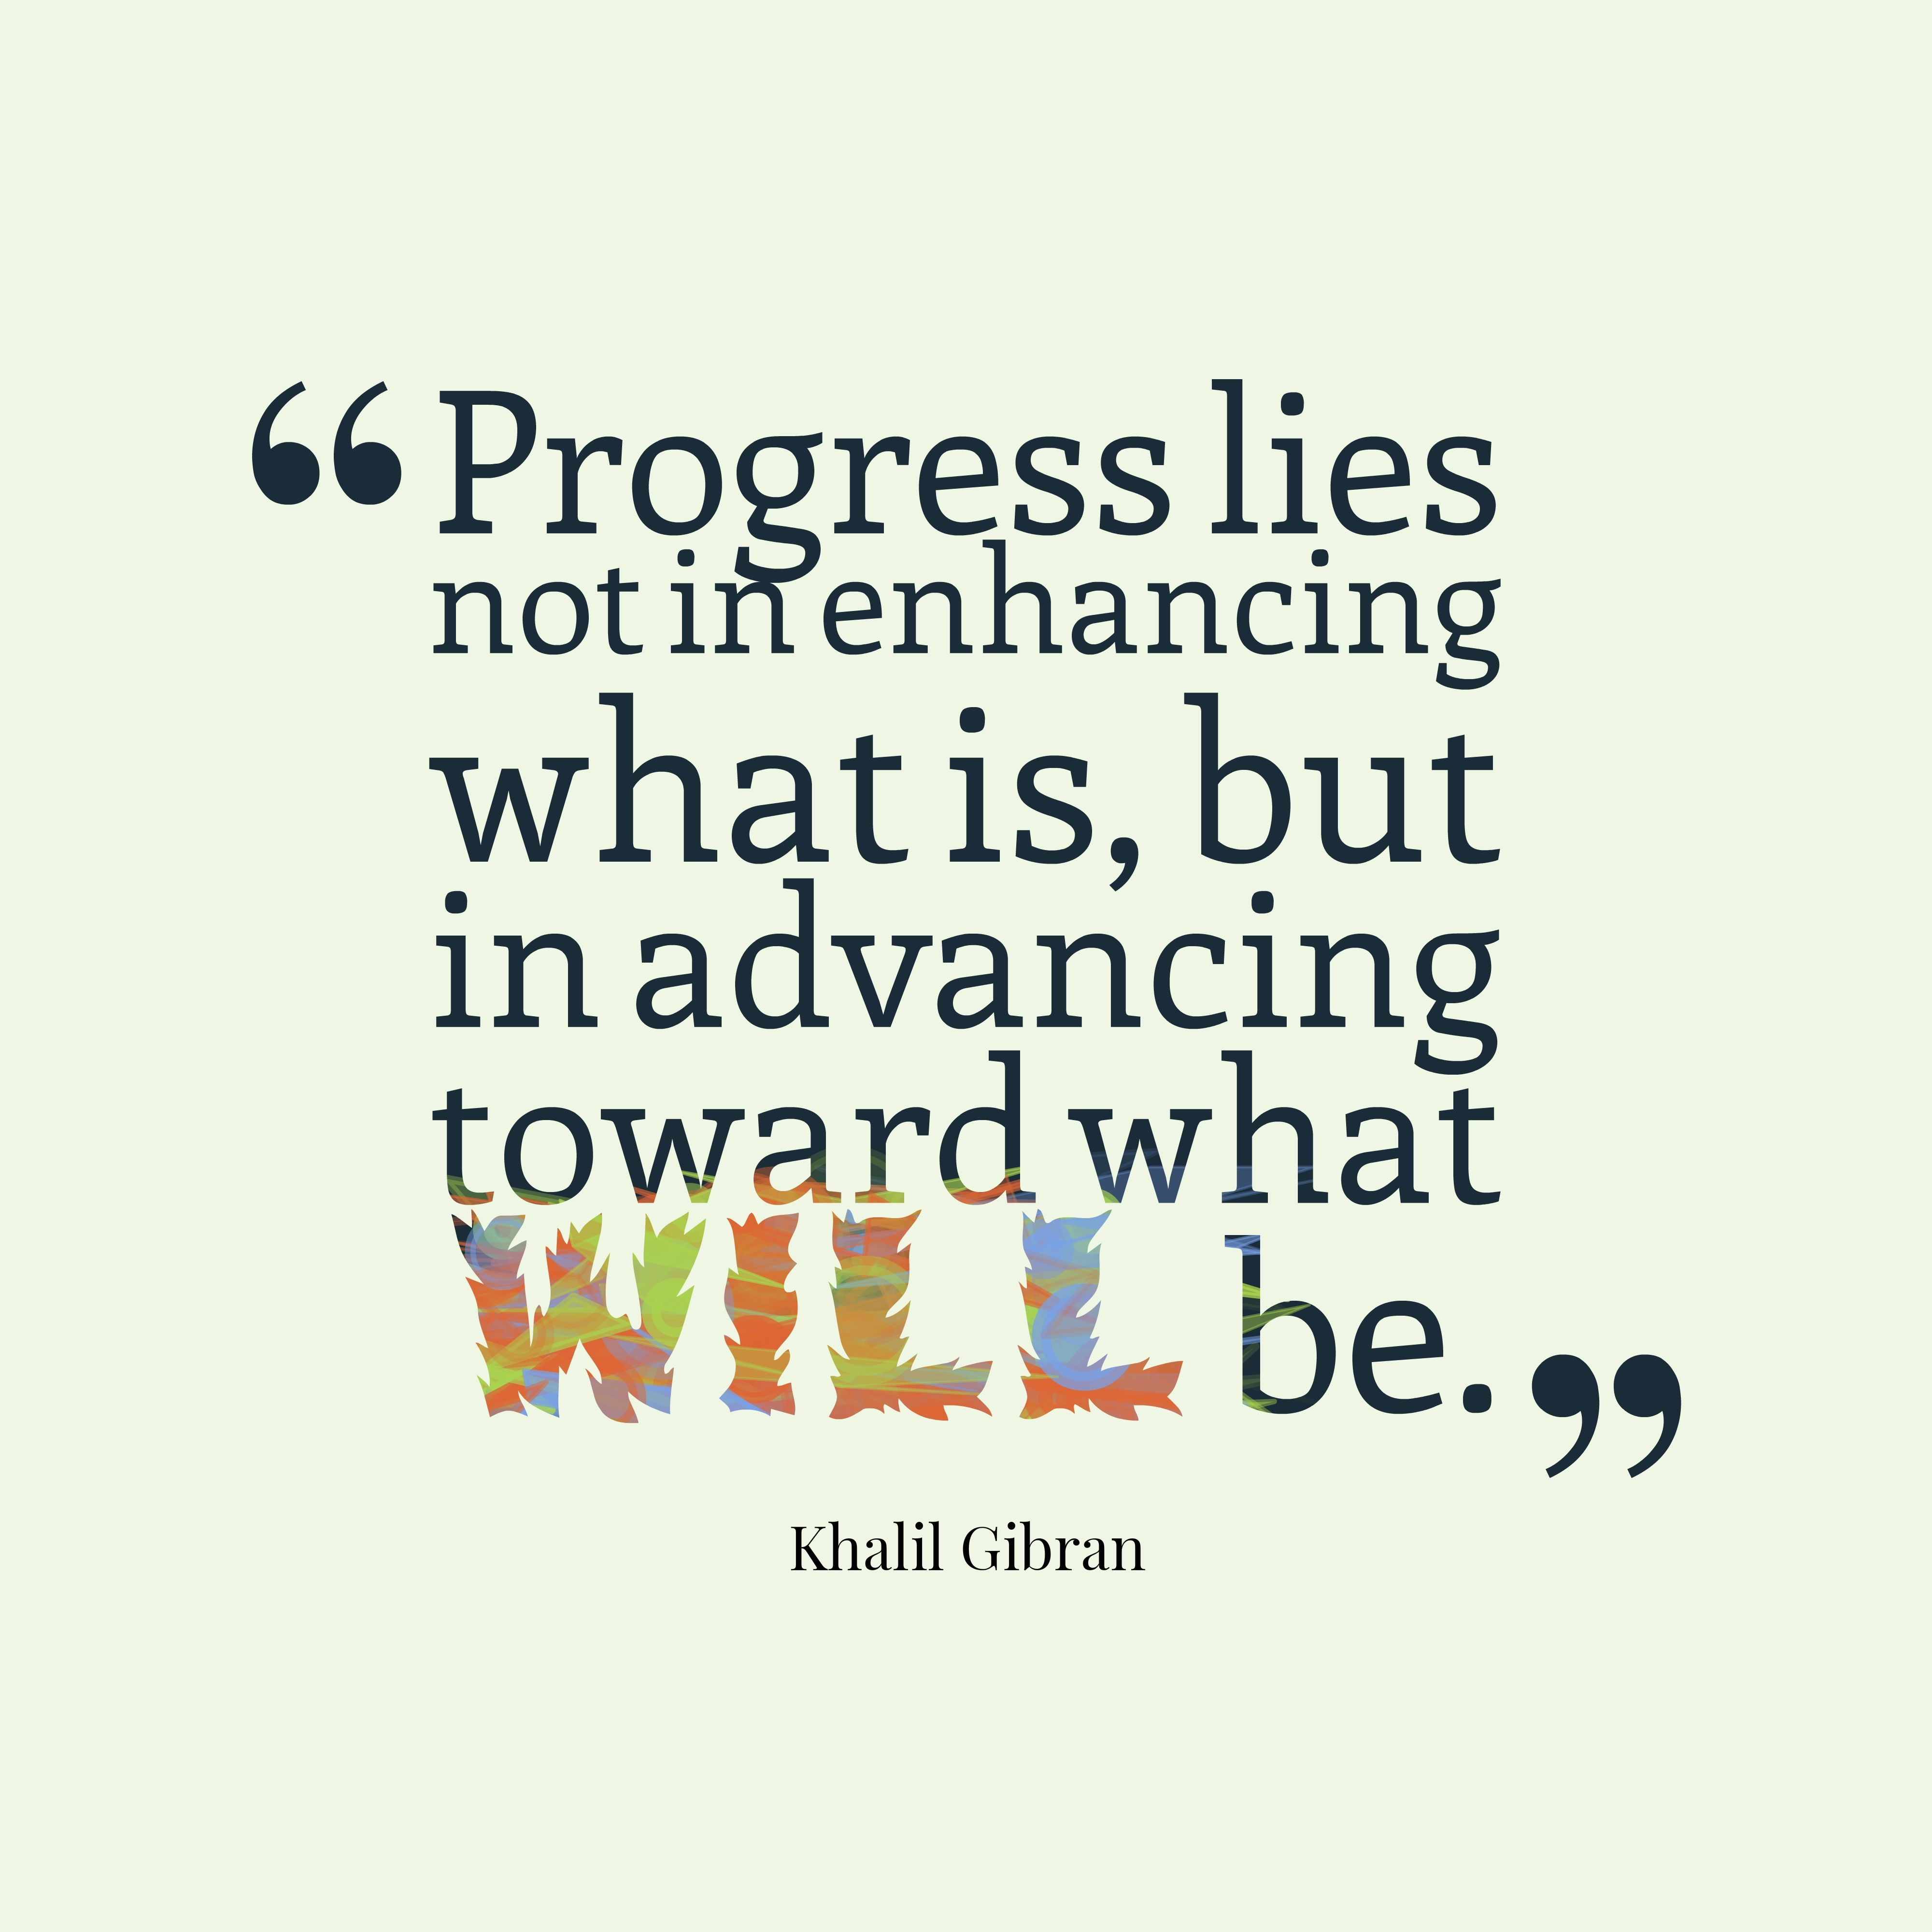 Futuristic Strengthsfinder Progress Quotes Inspirational Quotes Image Quotes